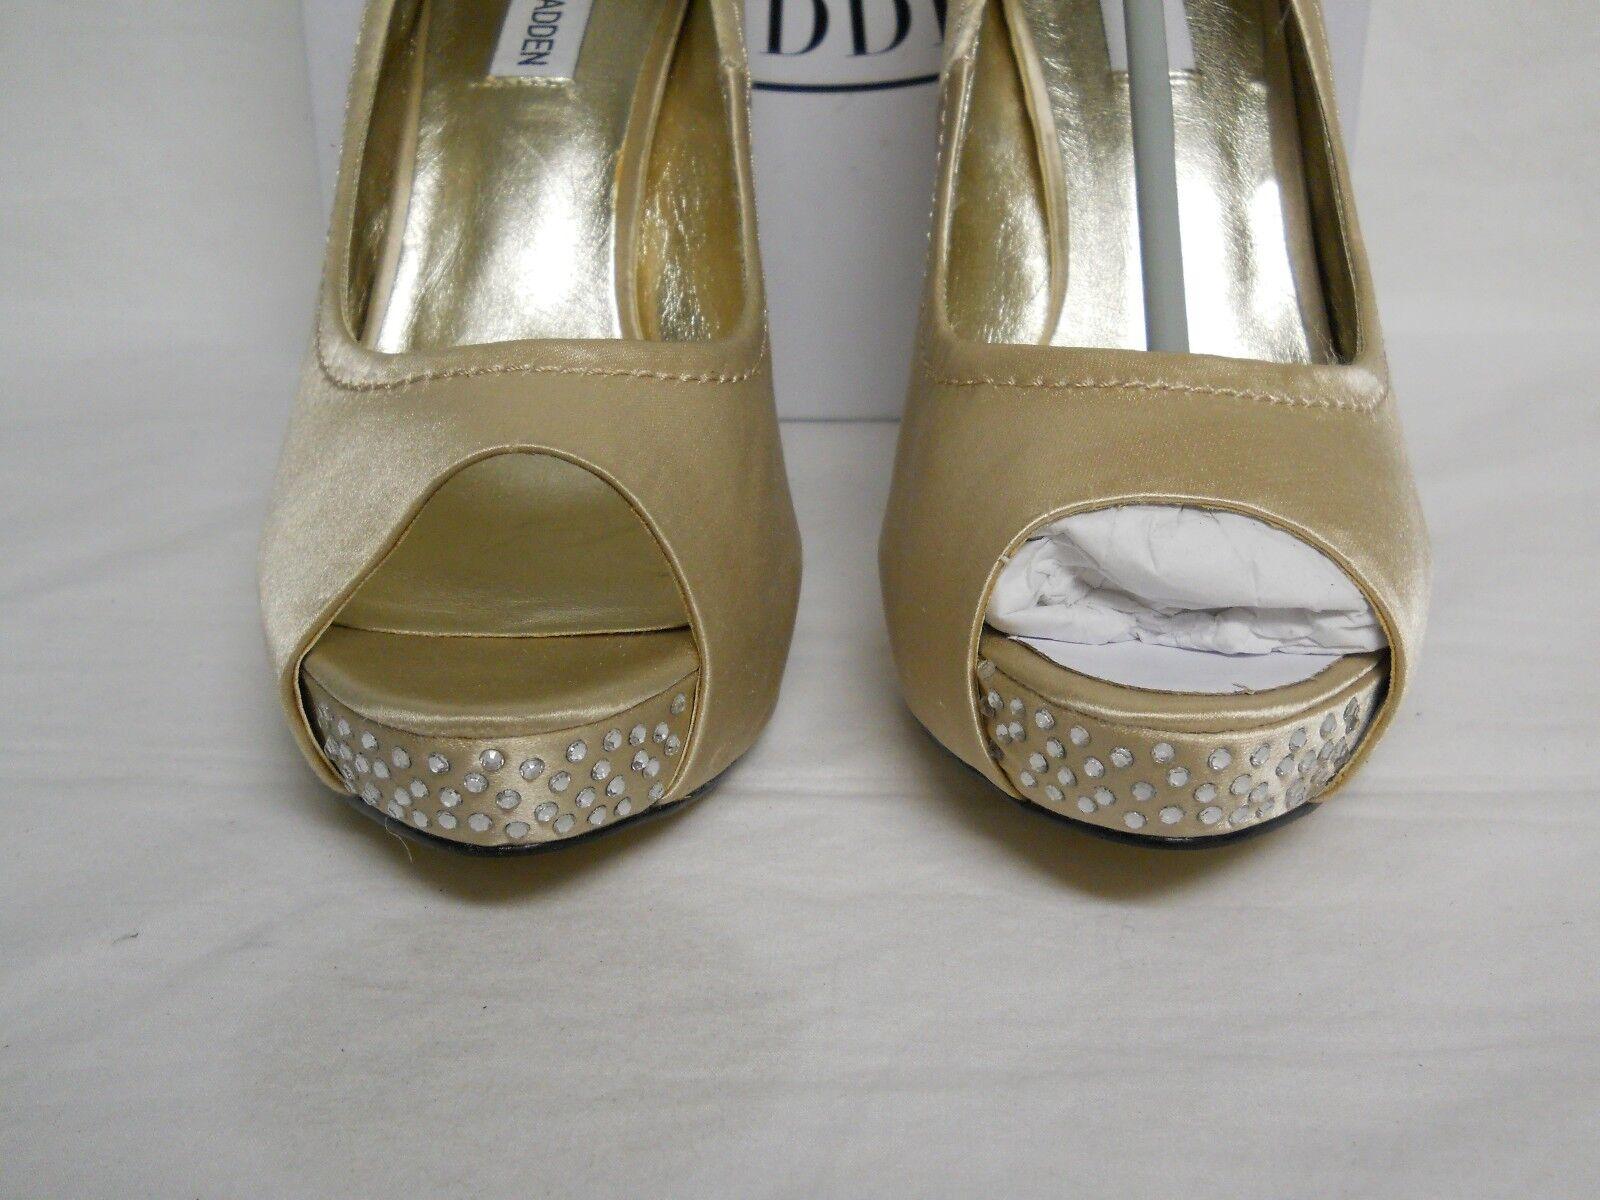 Steve Madden 10 M NEU Damenschuhe Feelixx Champagne Satin Open Toe Heels Schuhes NWB